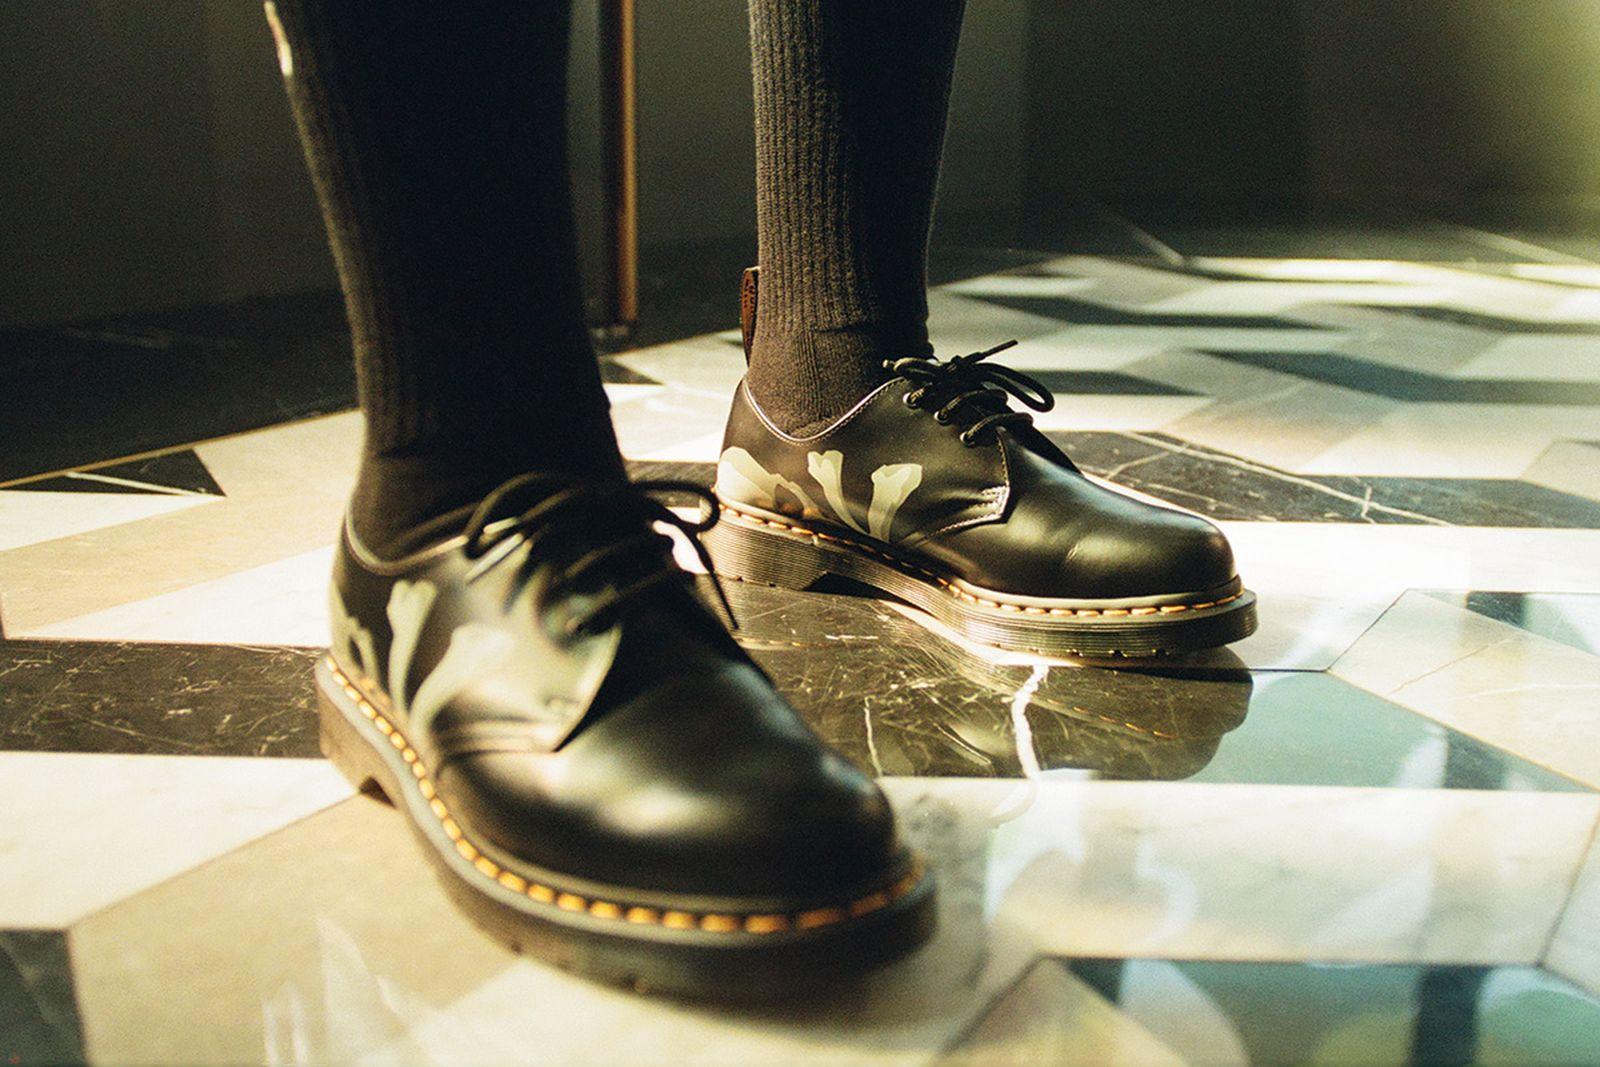 bape-mastermind-dr-martens-1461-shoe-release-date-price-02